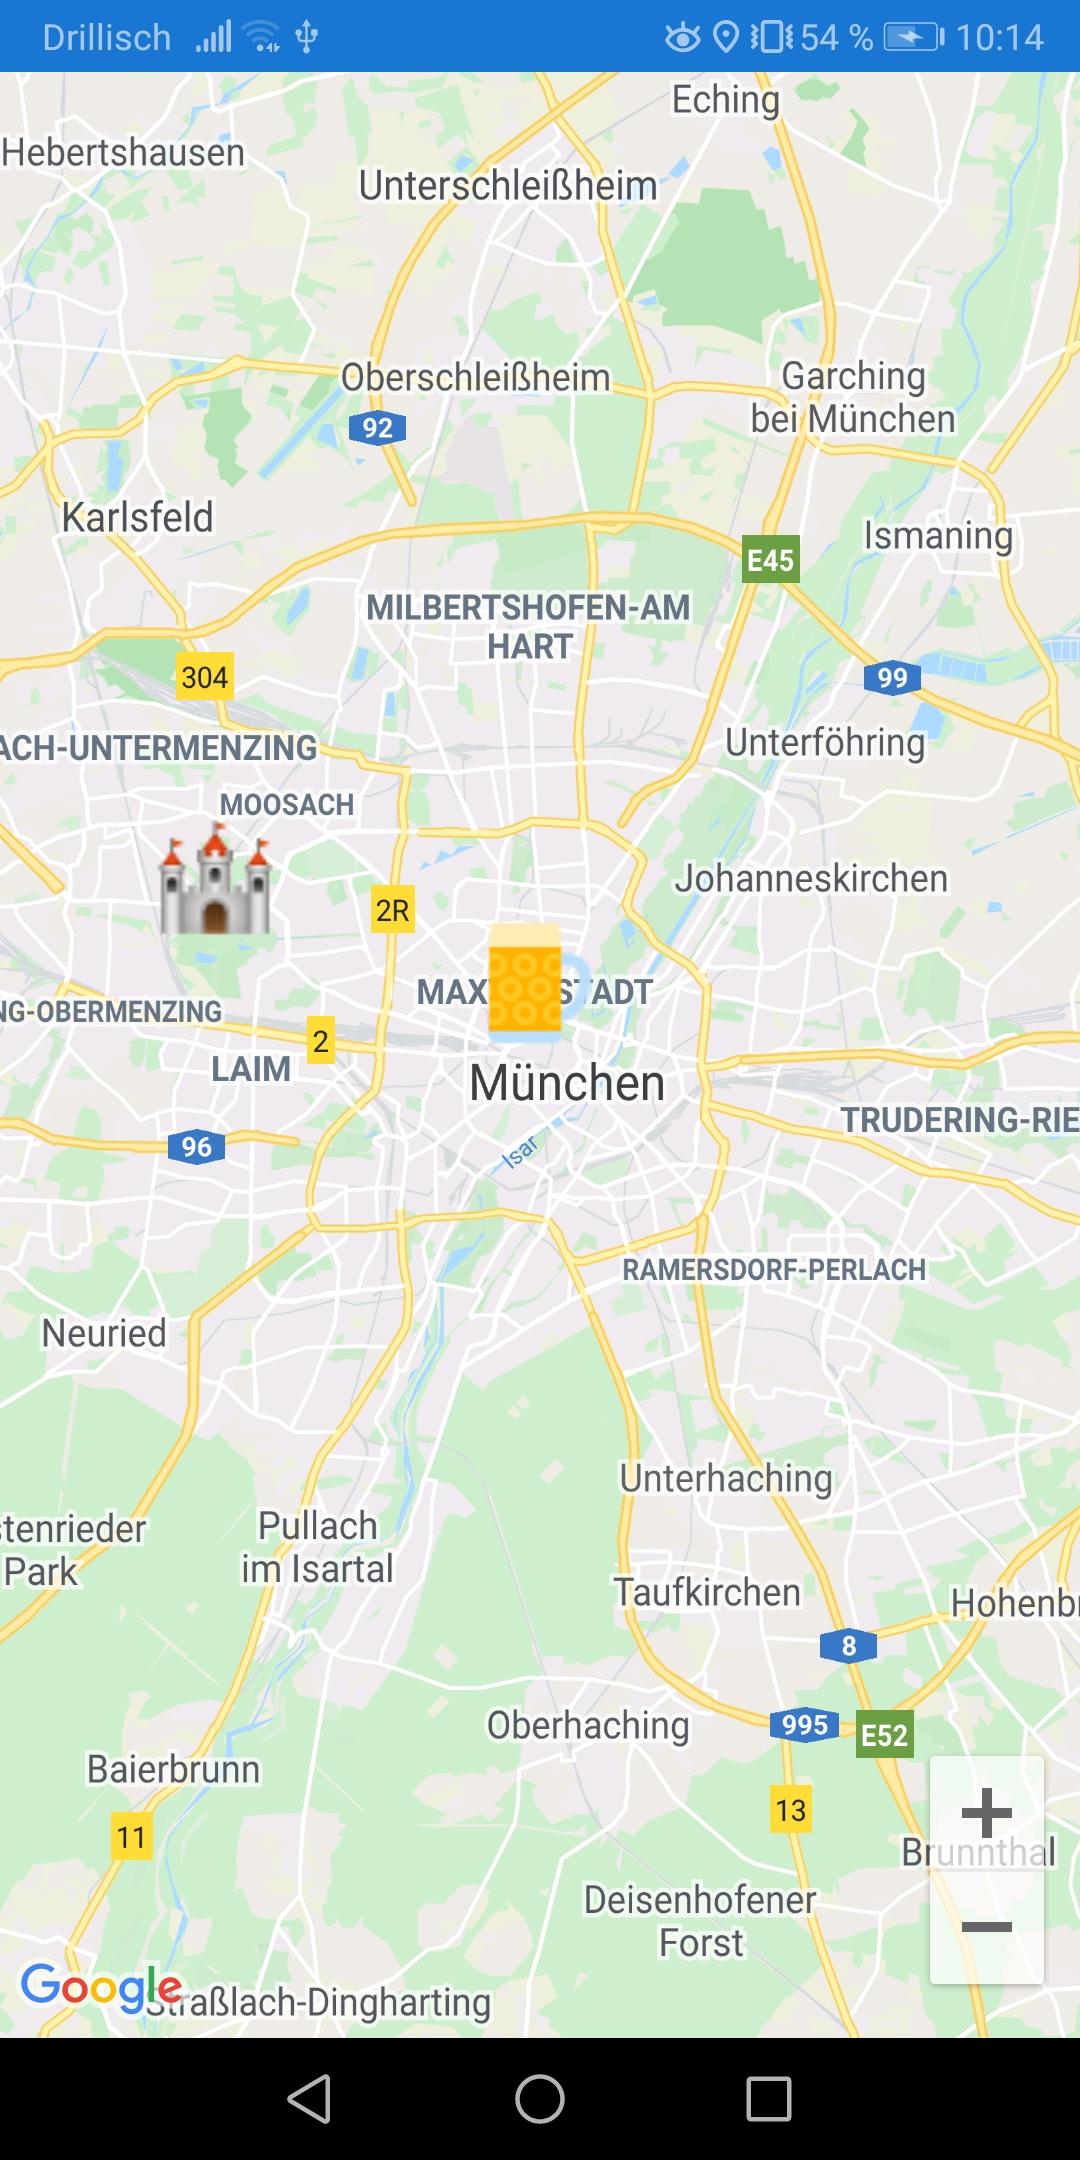 Screenshot Xamarin Forms App with custom Google Maps Pin marker image Nerd Corner